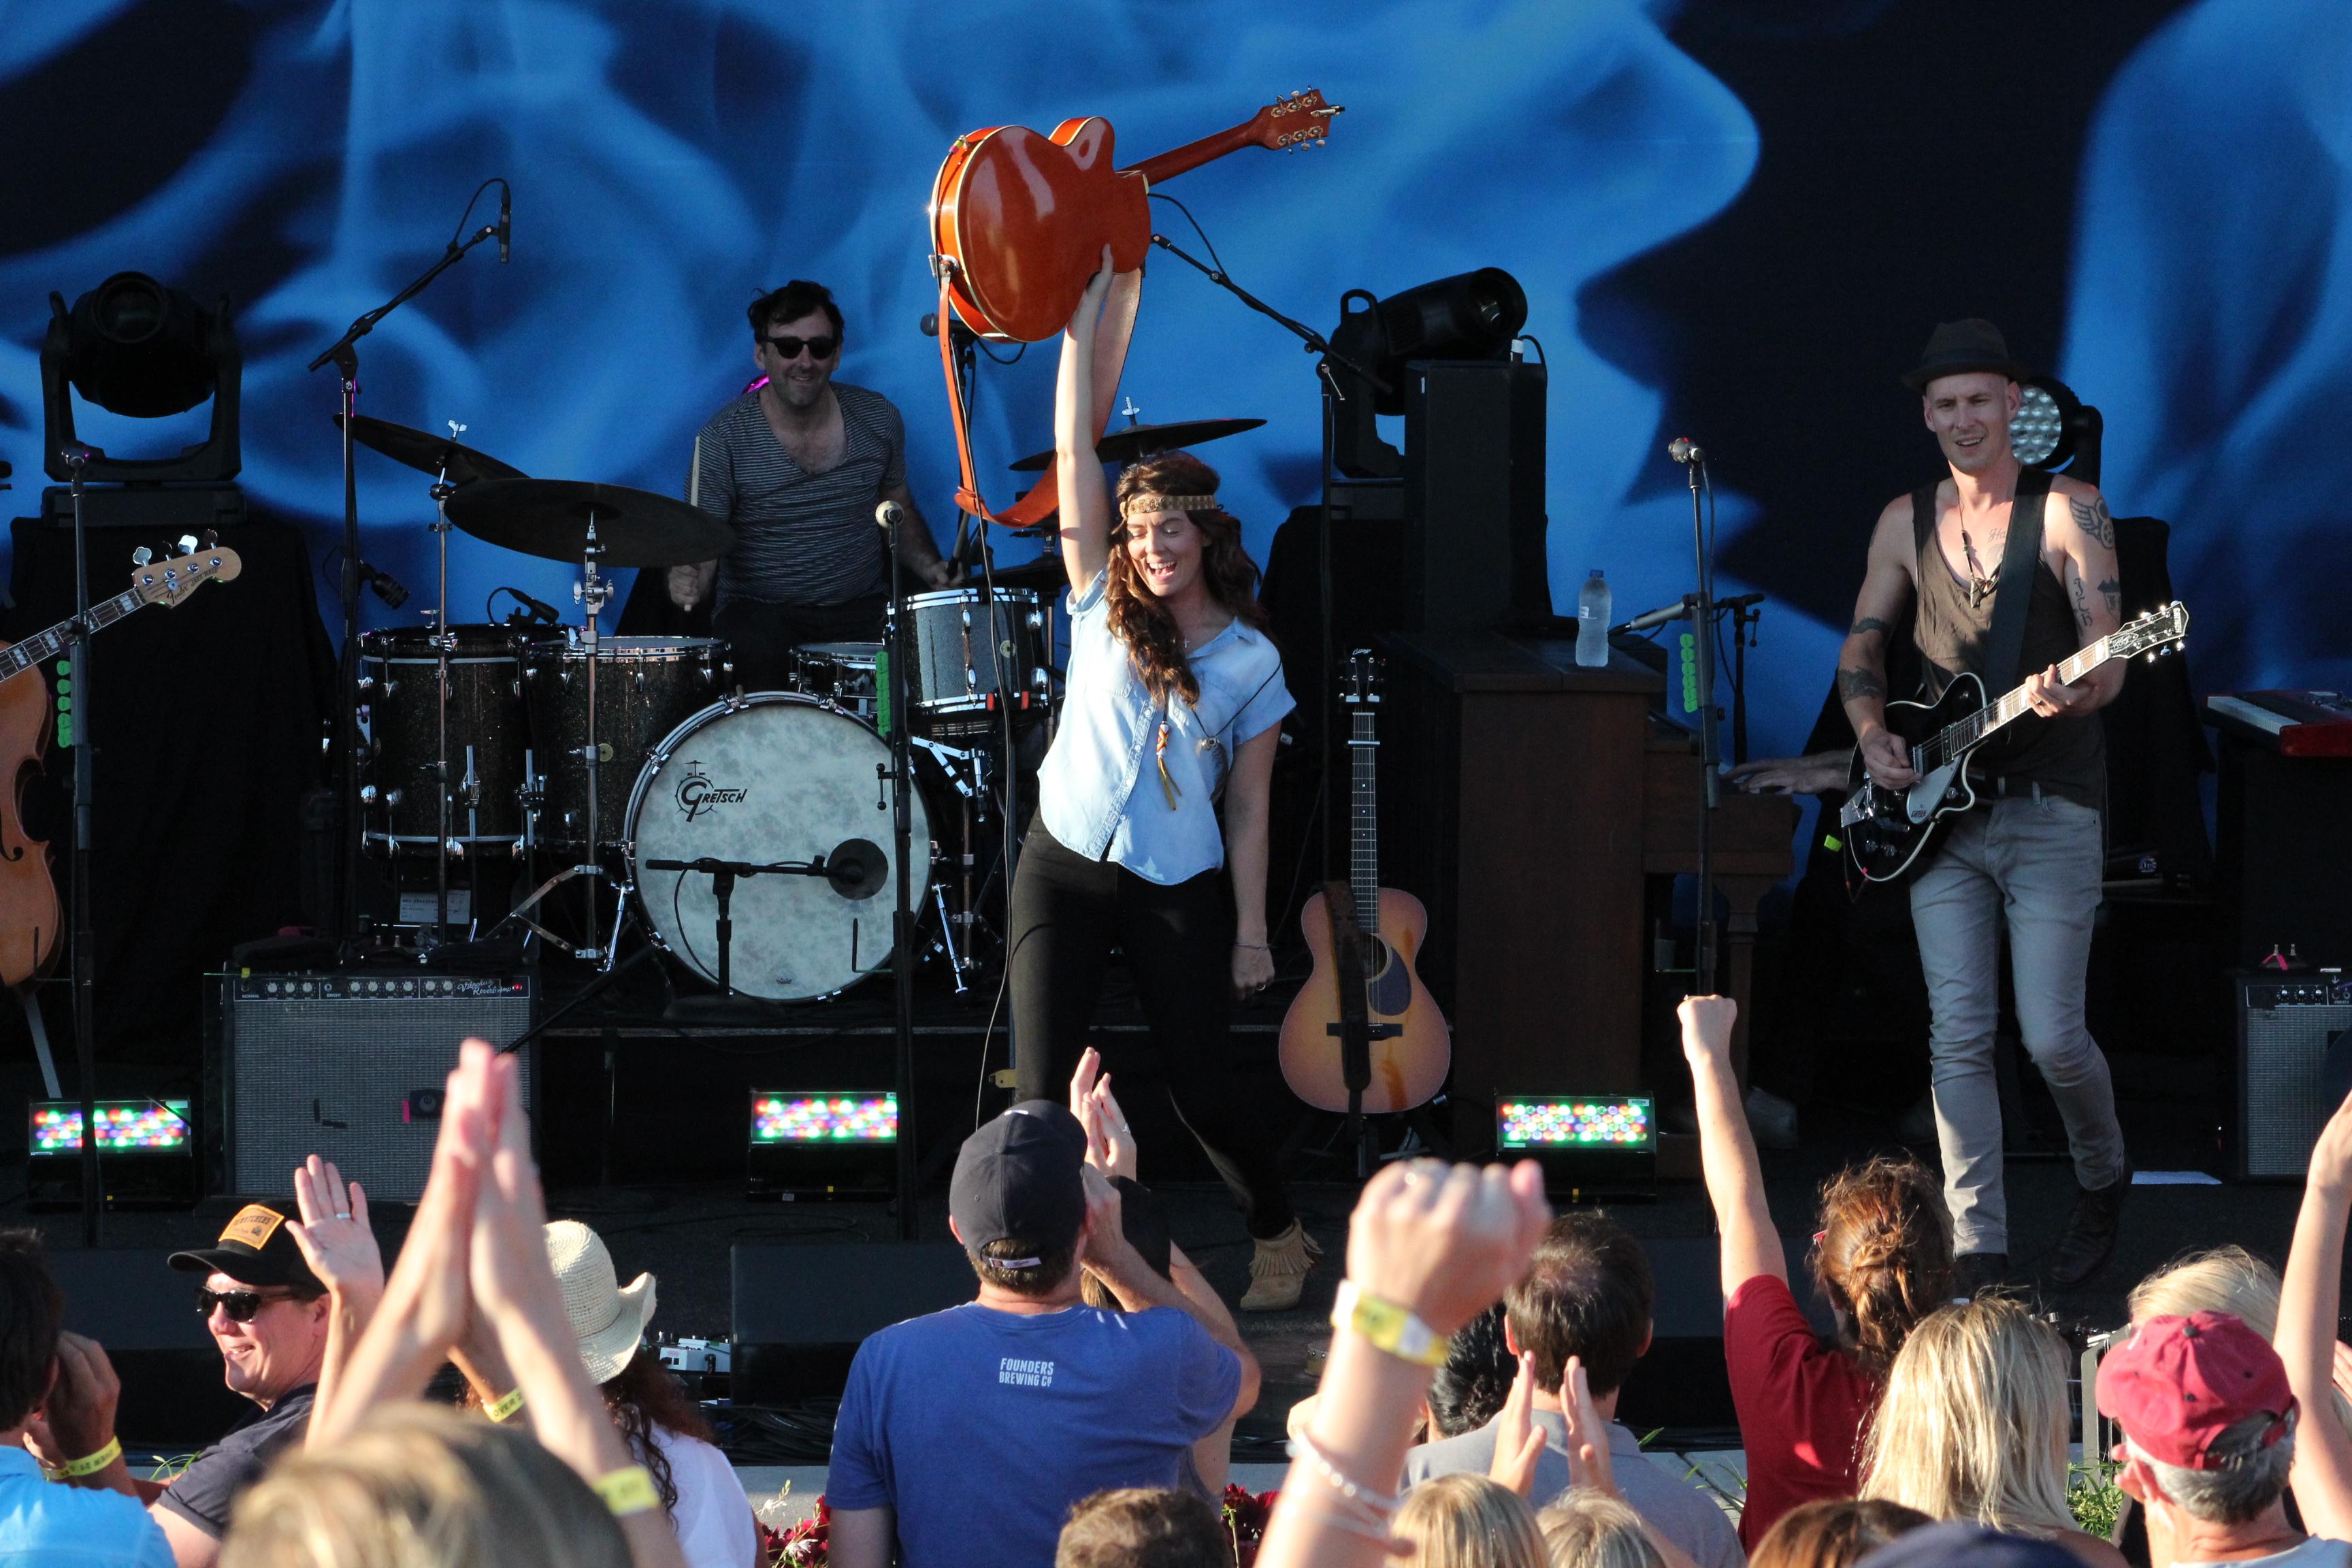 Brandi Carlile to kick off Lansing's Common Ground festival